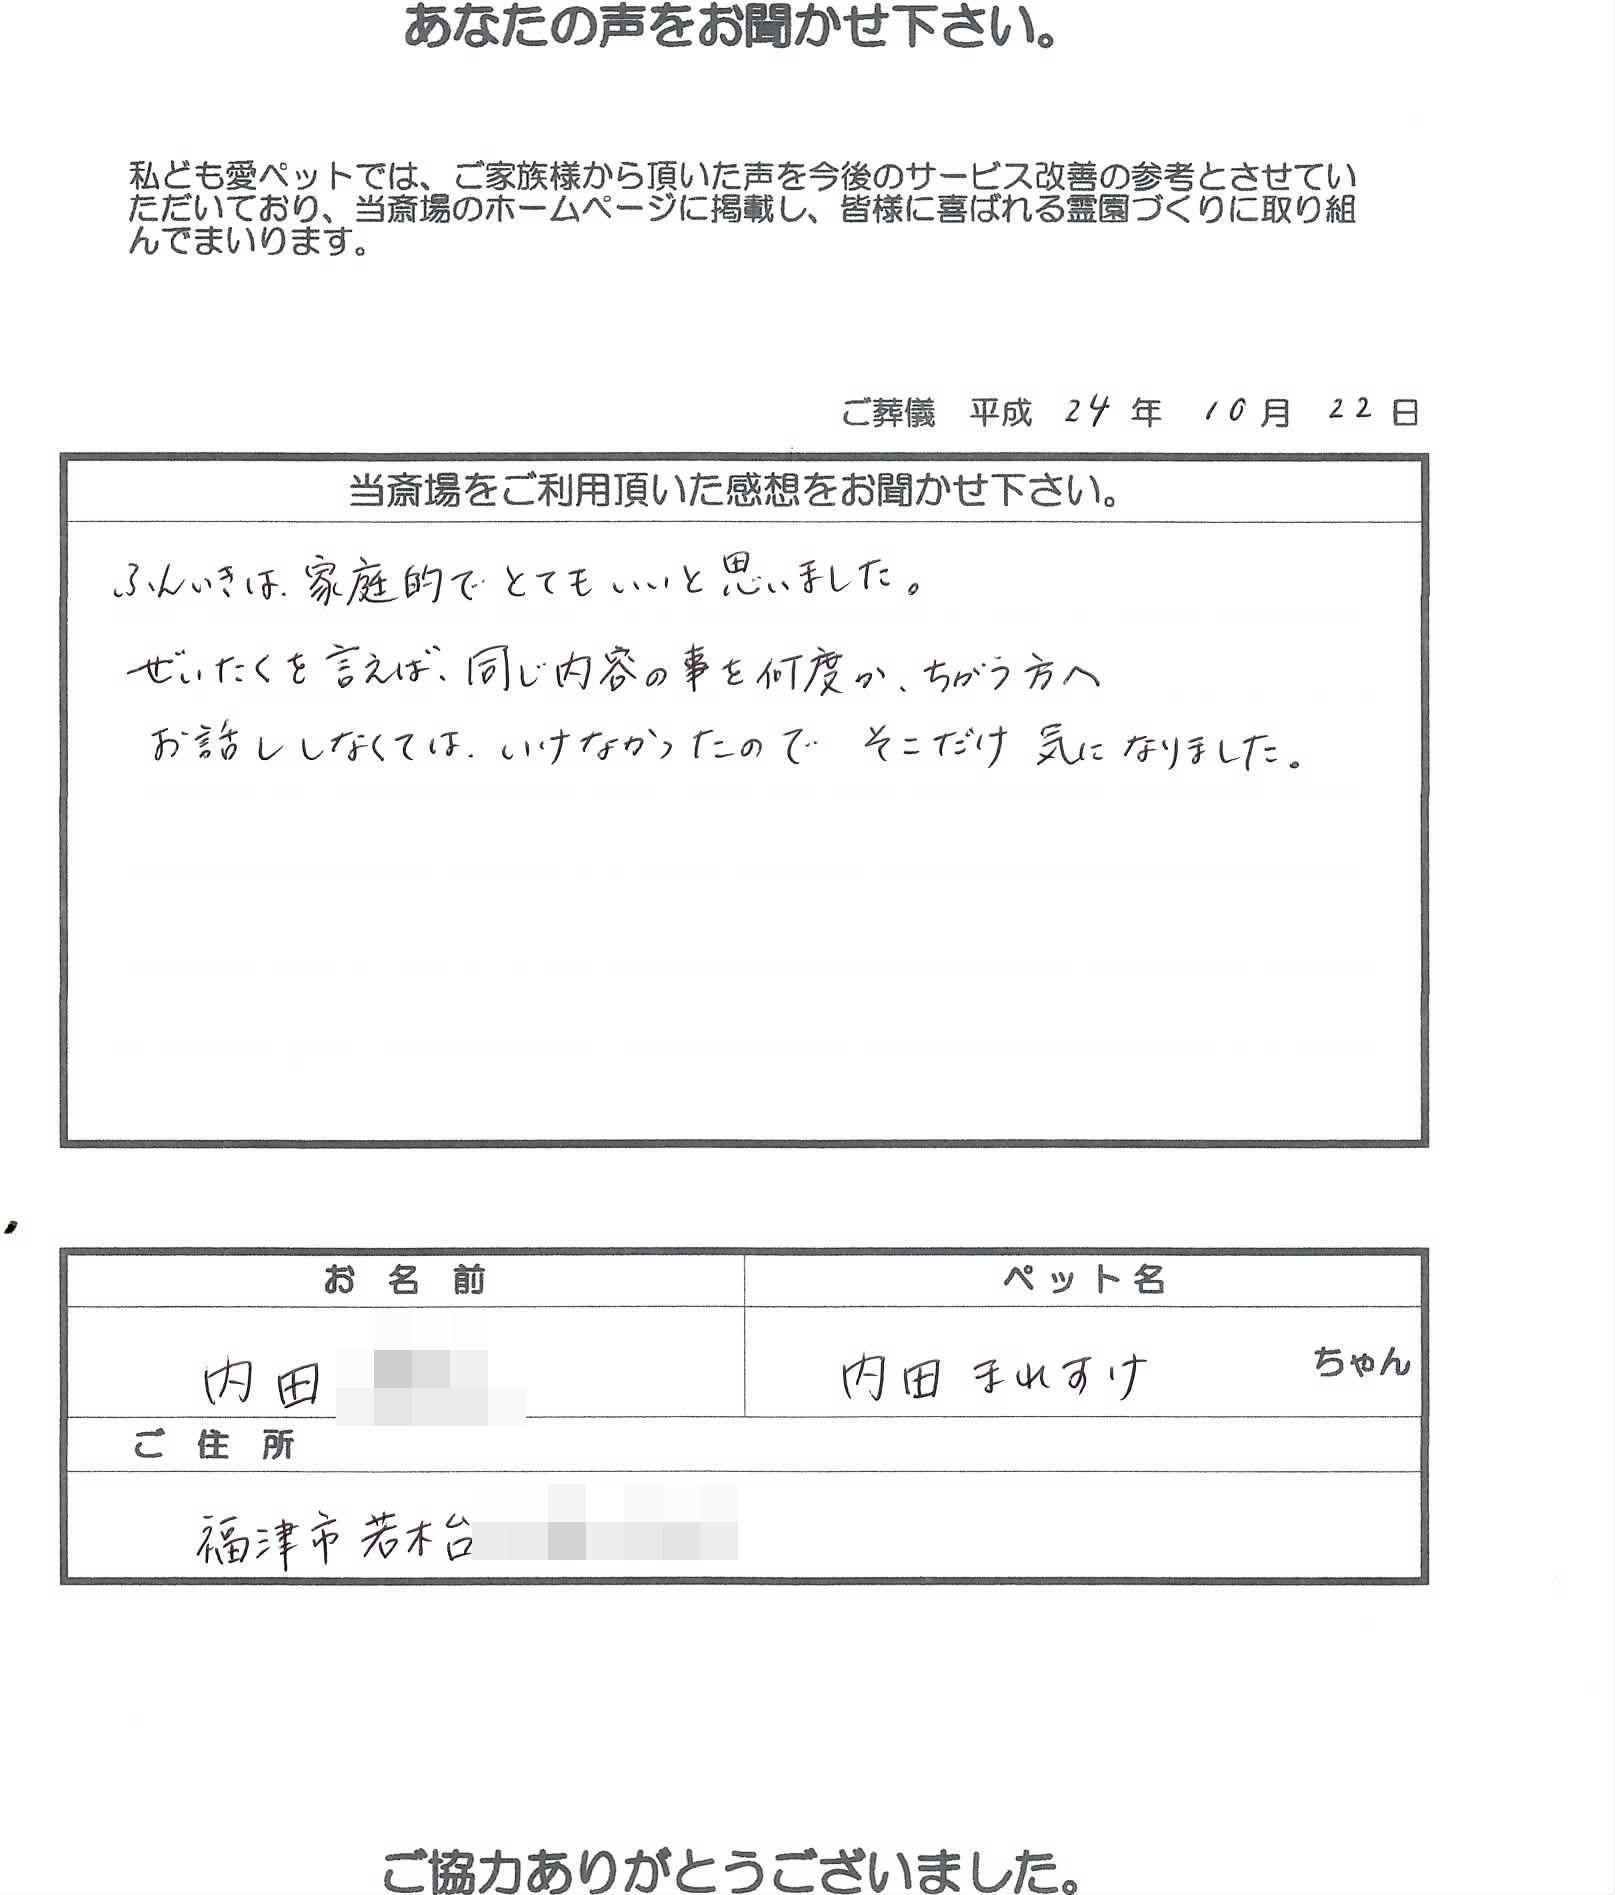 k121022-1.jpg